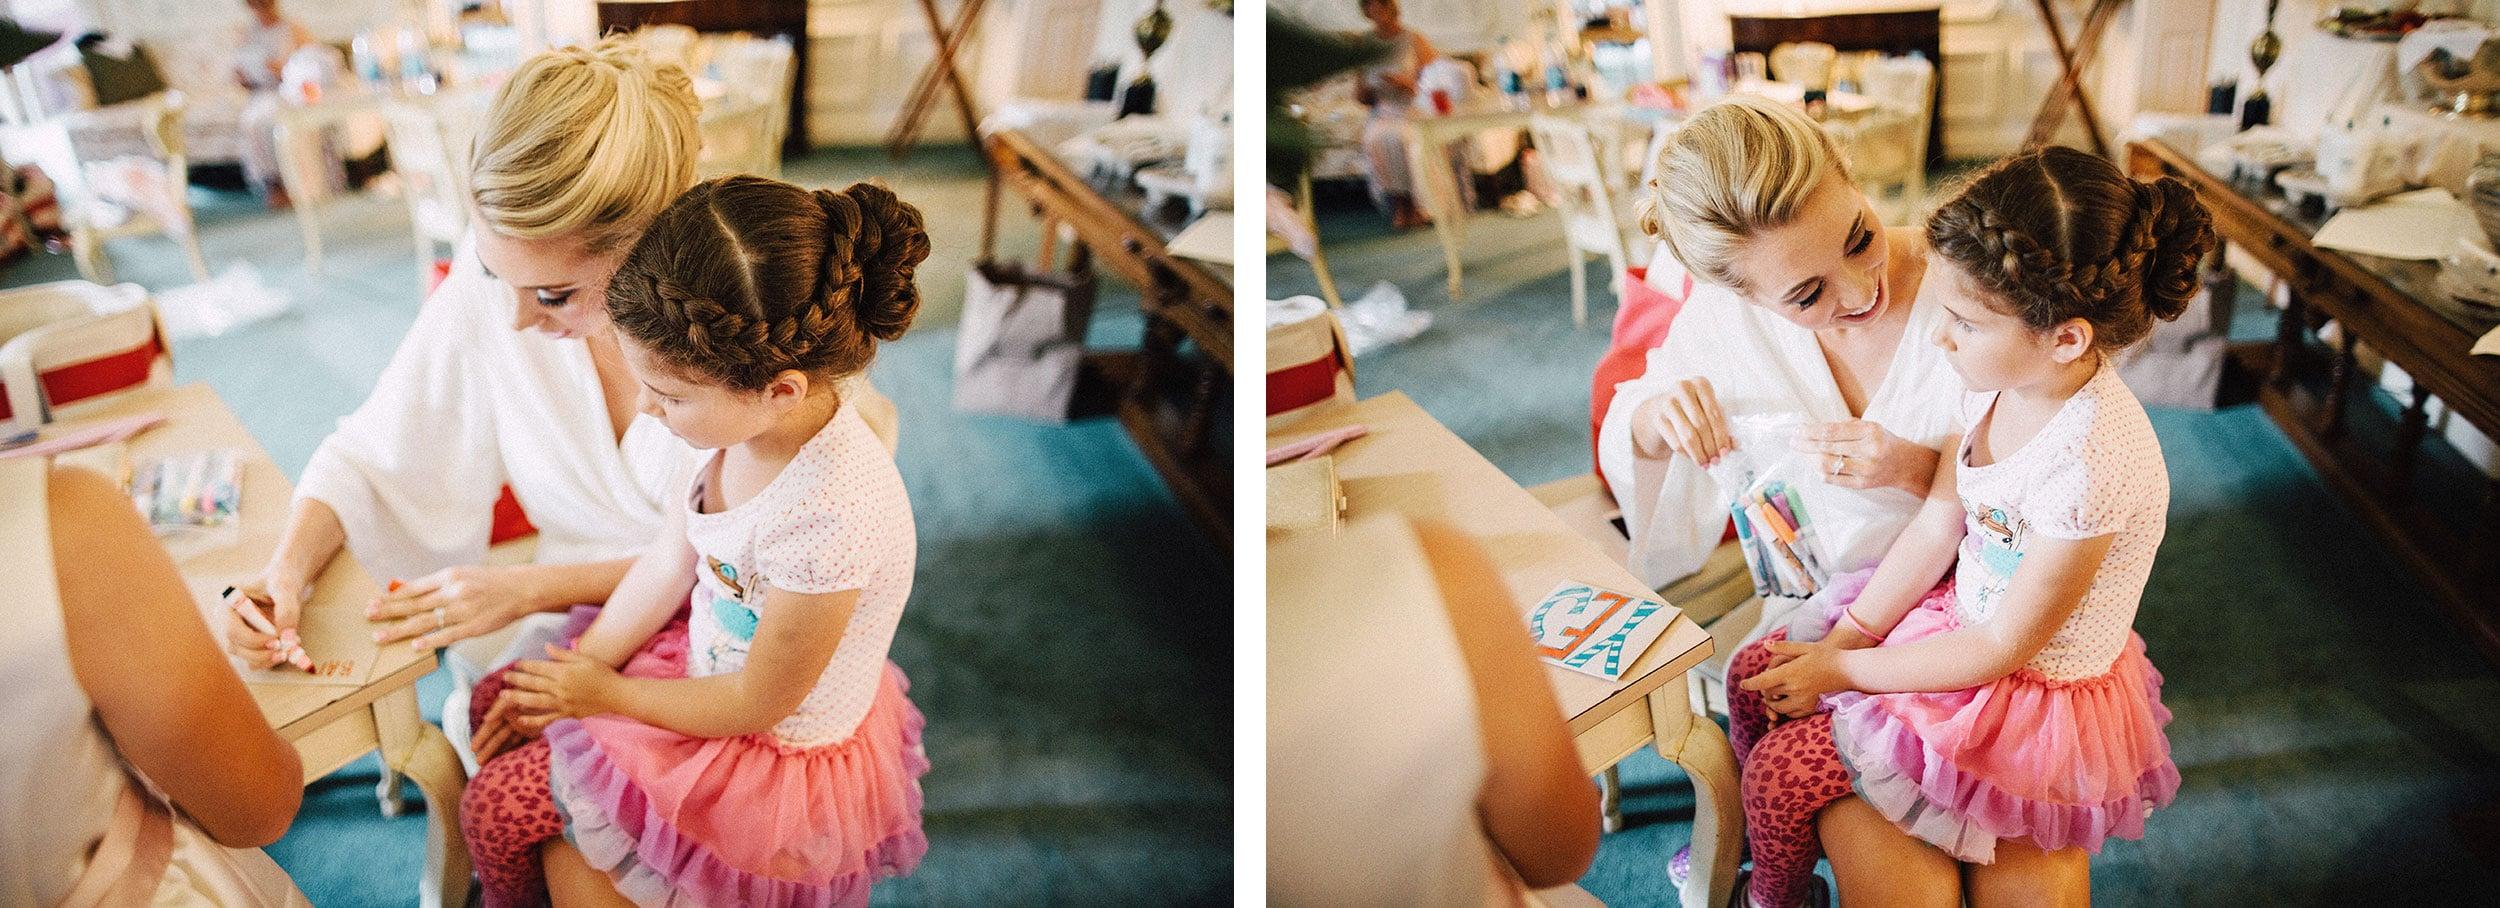 spindletop-lexington-wedding-photographer-007.JPG